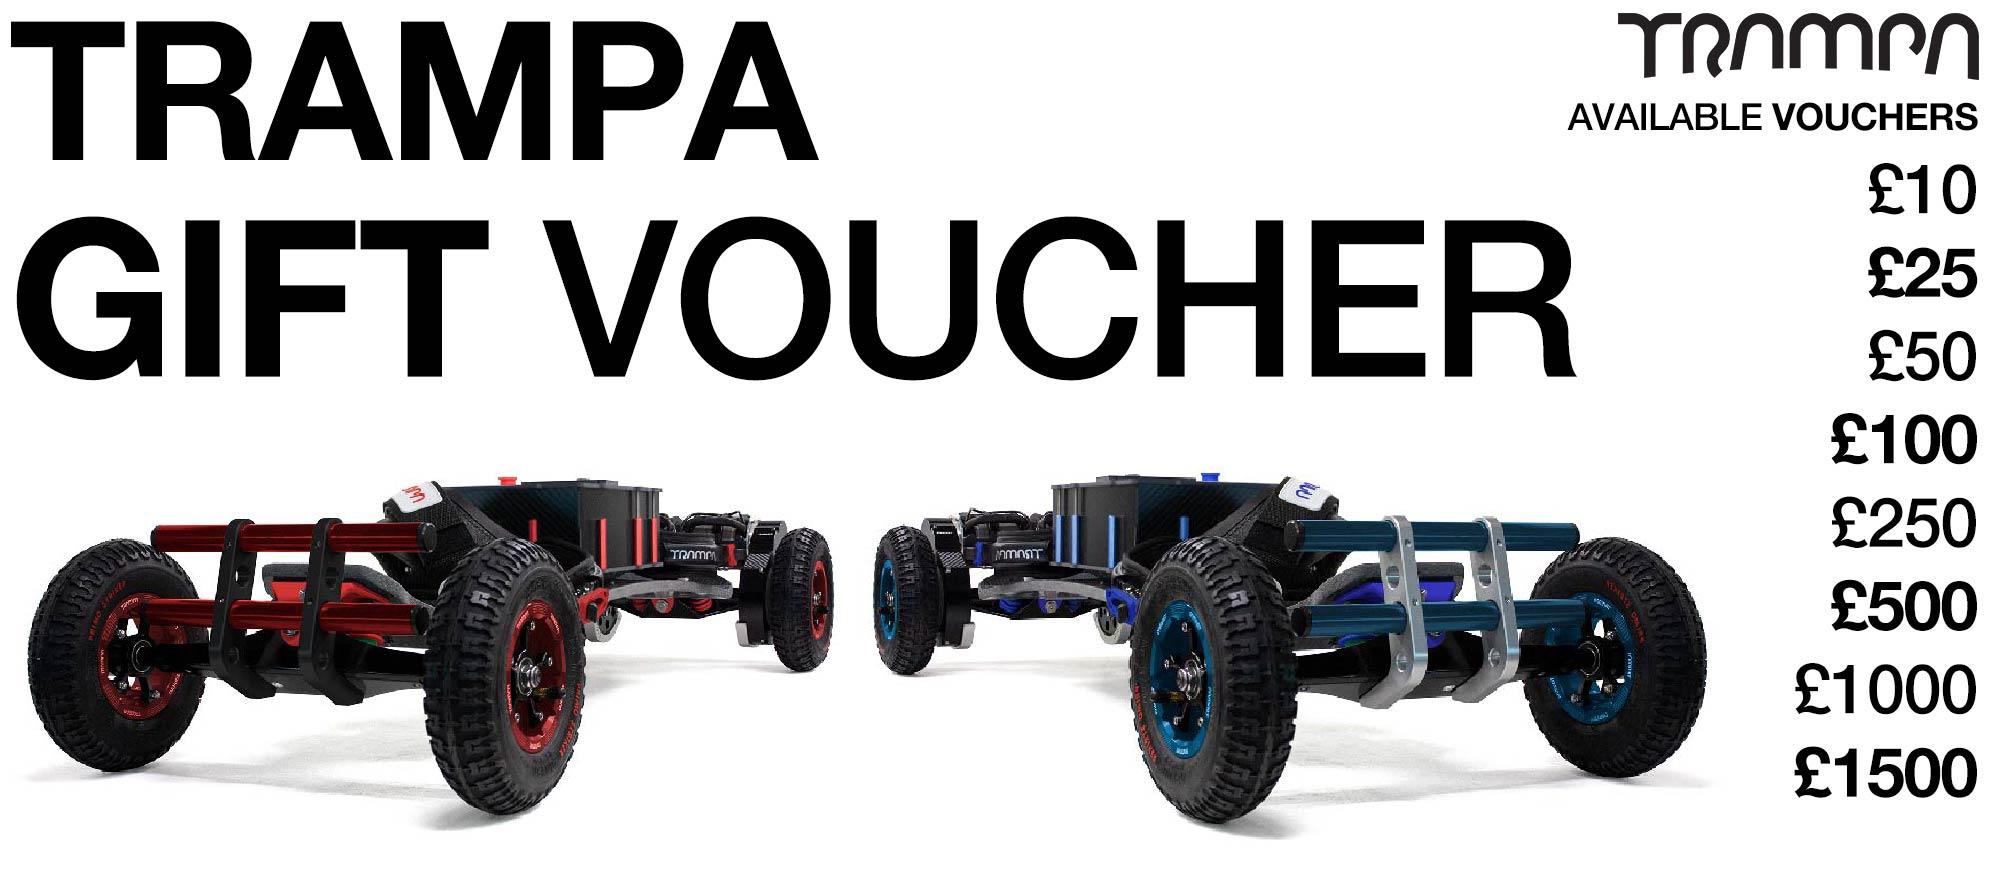 Gift Voucher for NON UK Customers